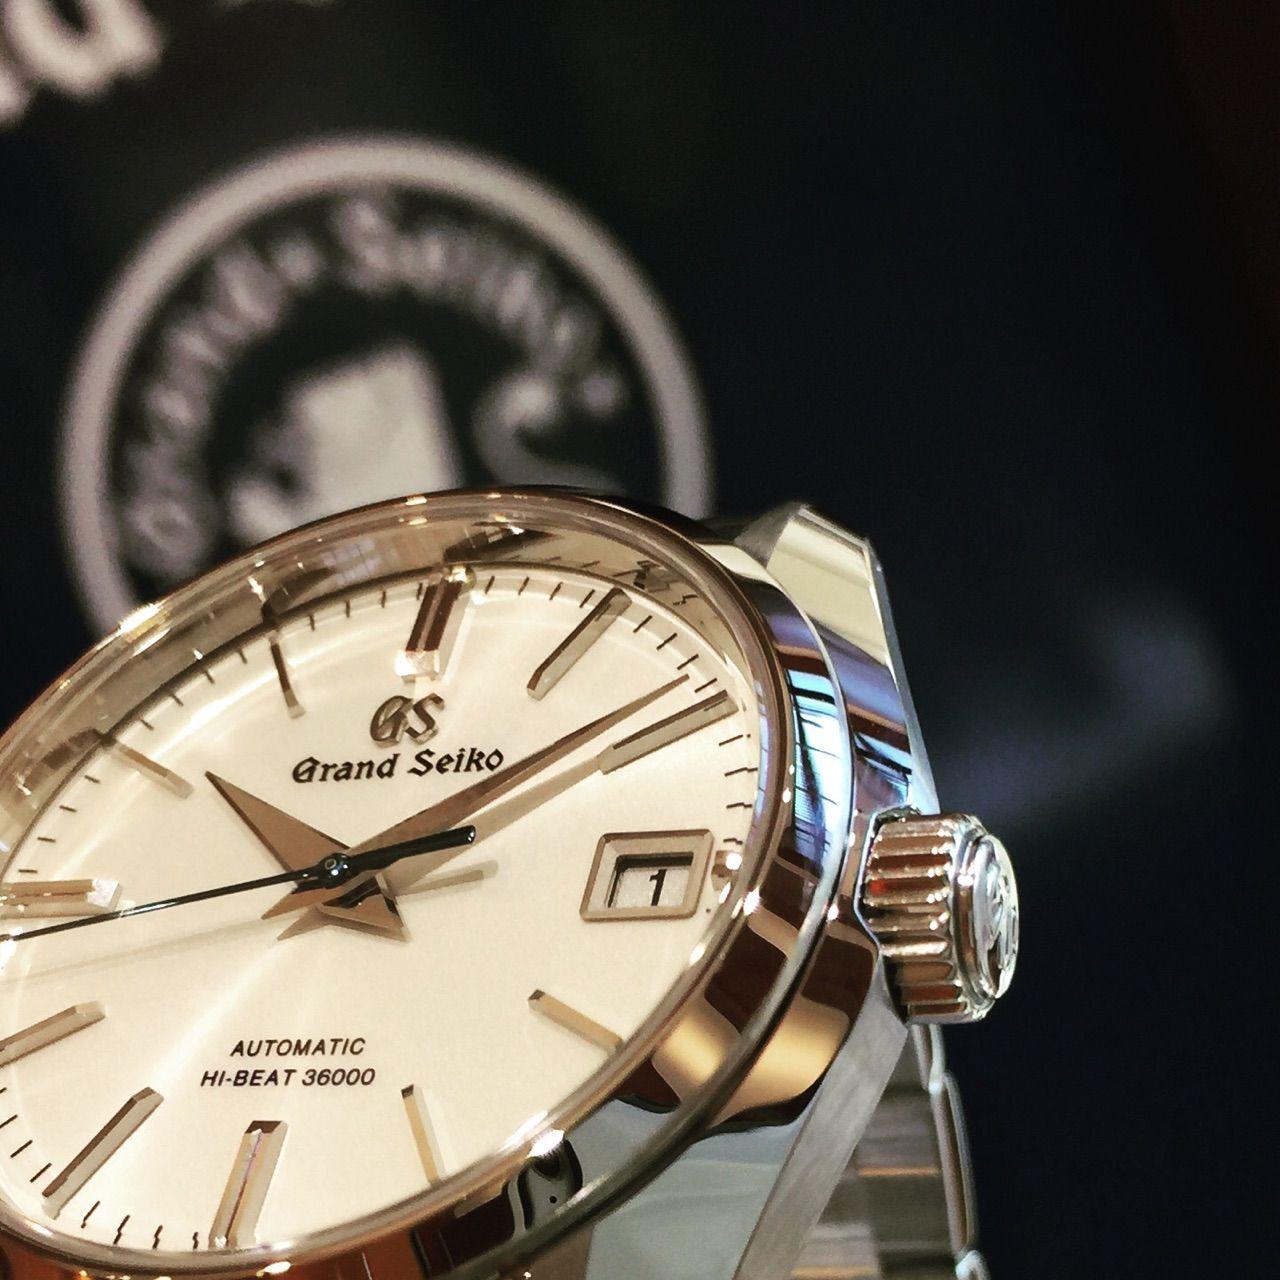 newest collection ac75a 2269b GS SBGH201 青色の秒針が素敵なモデル (^^) : 輸入時計 正規販売 ...